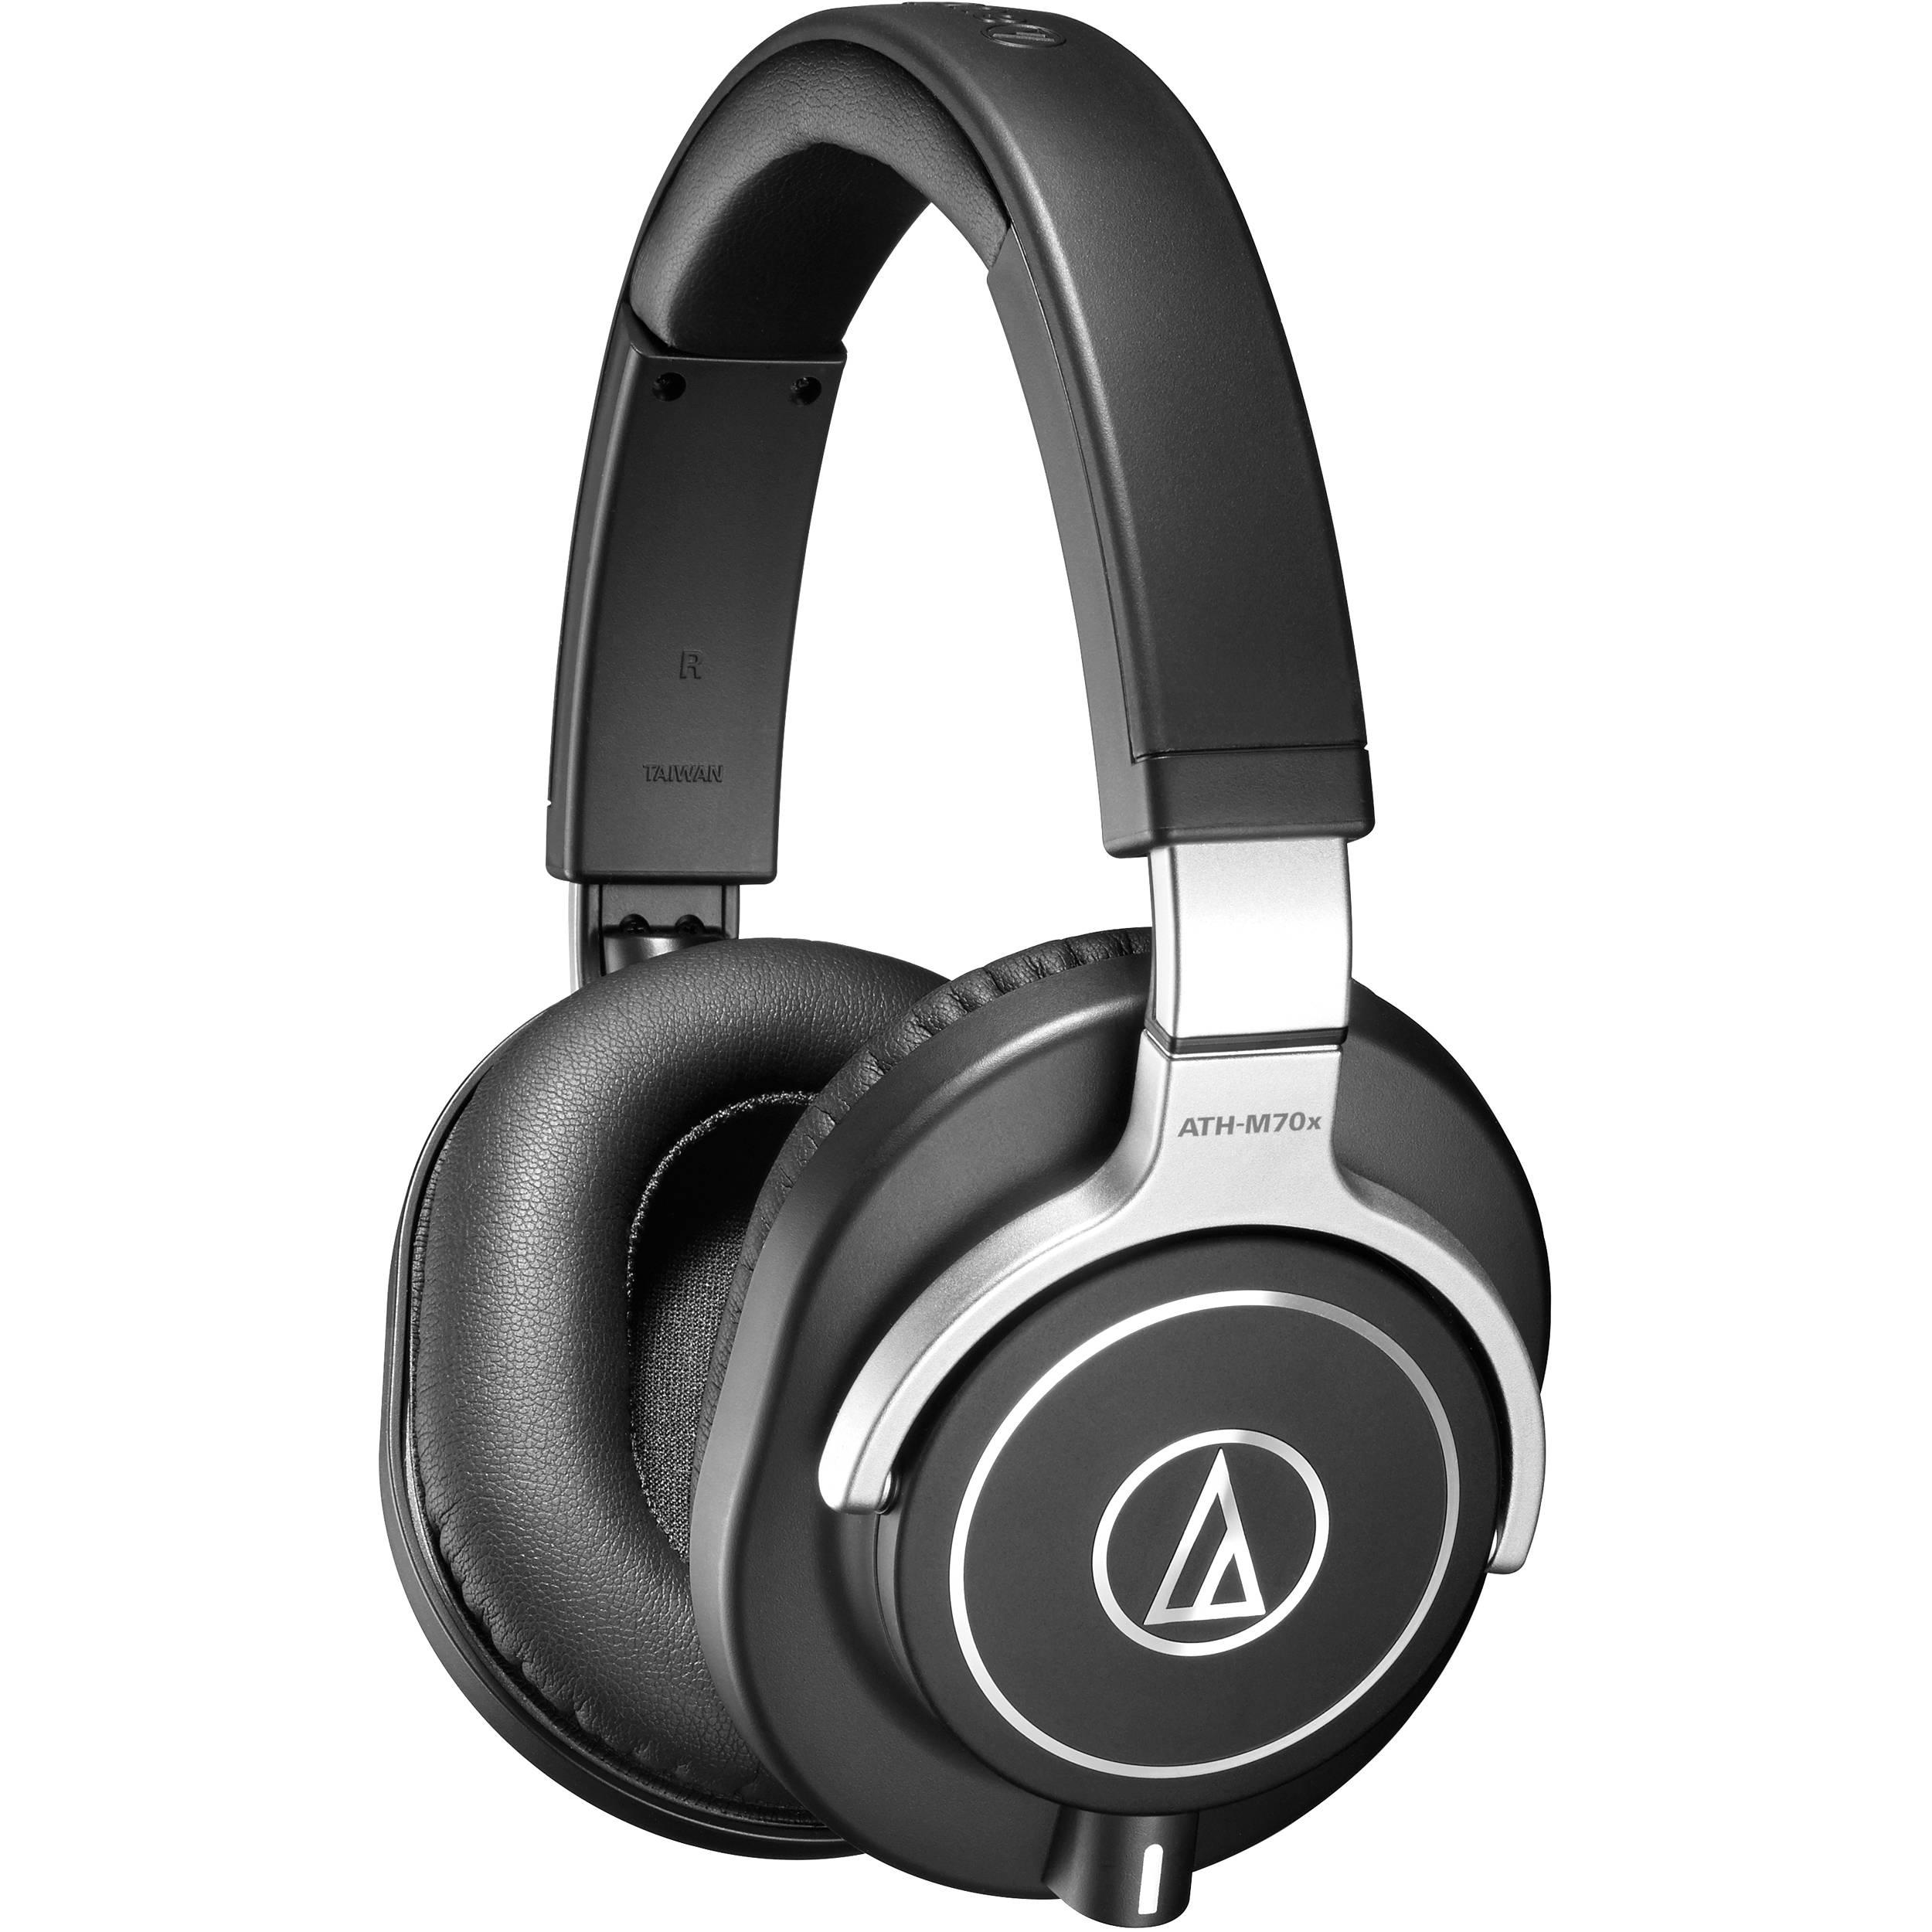 Audio-Technica ATH-M70x Pro Monitor Headphones ATH-M70X B&H